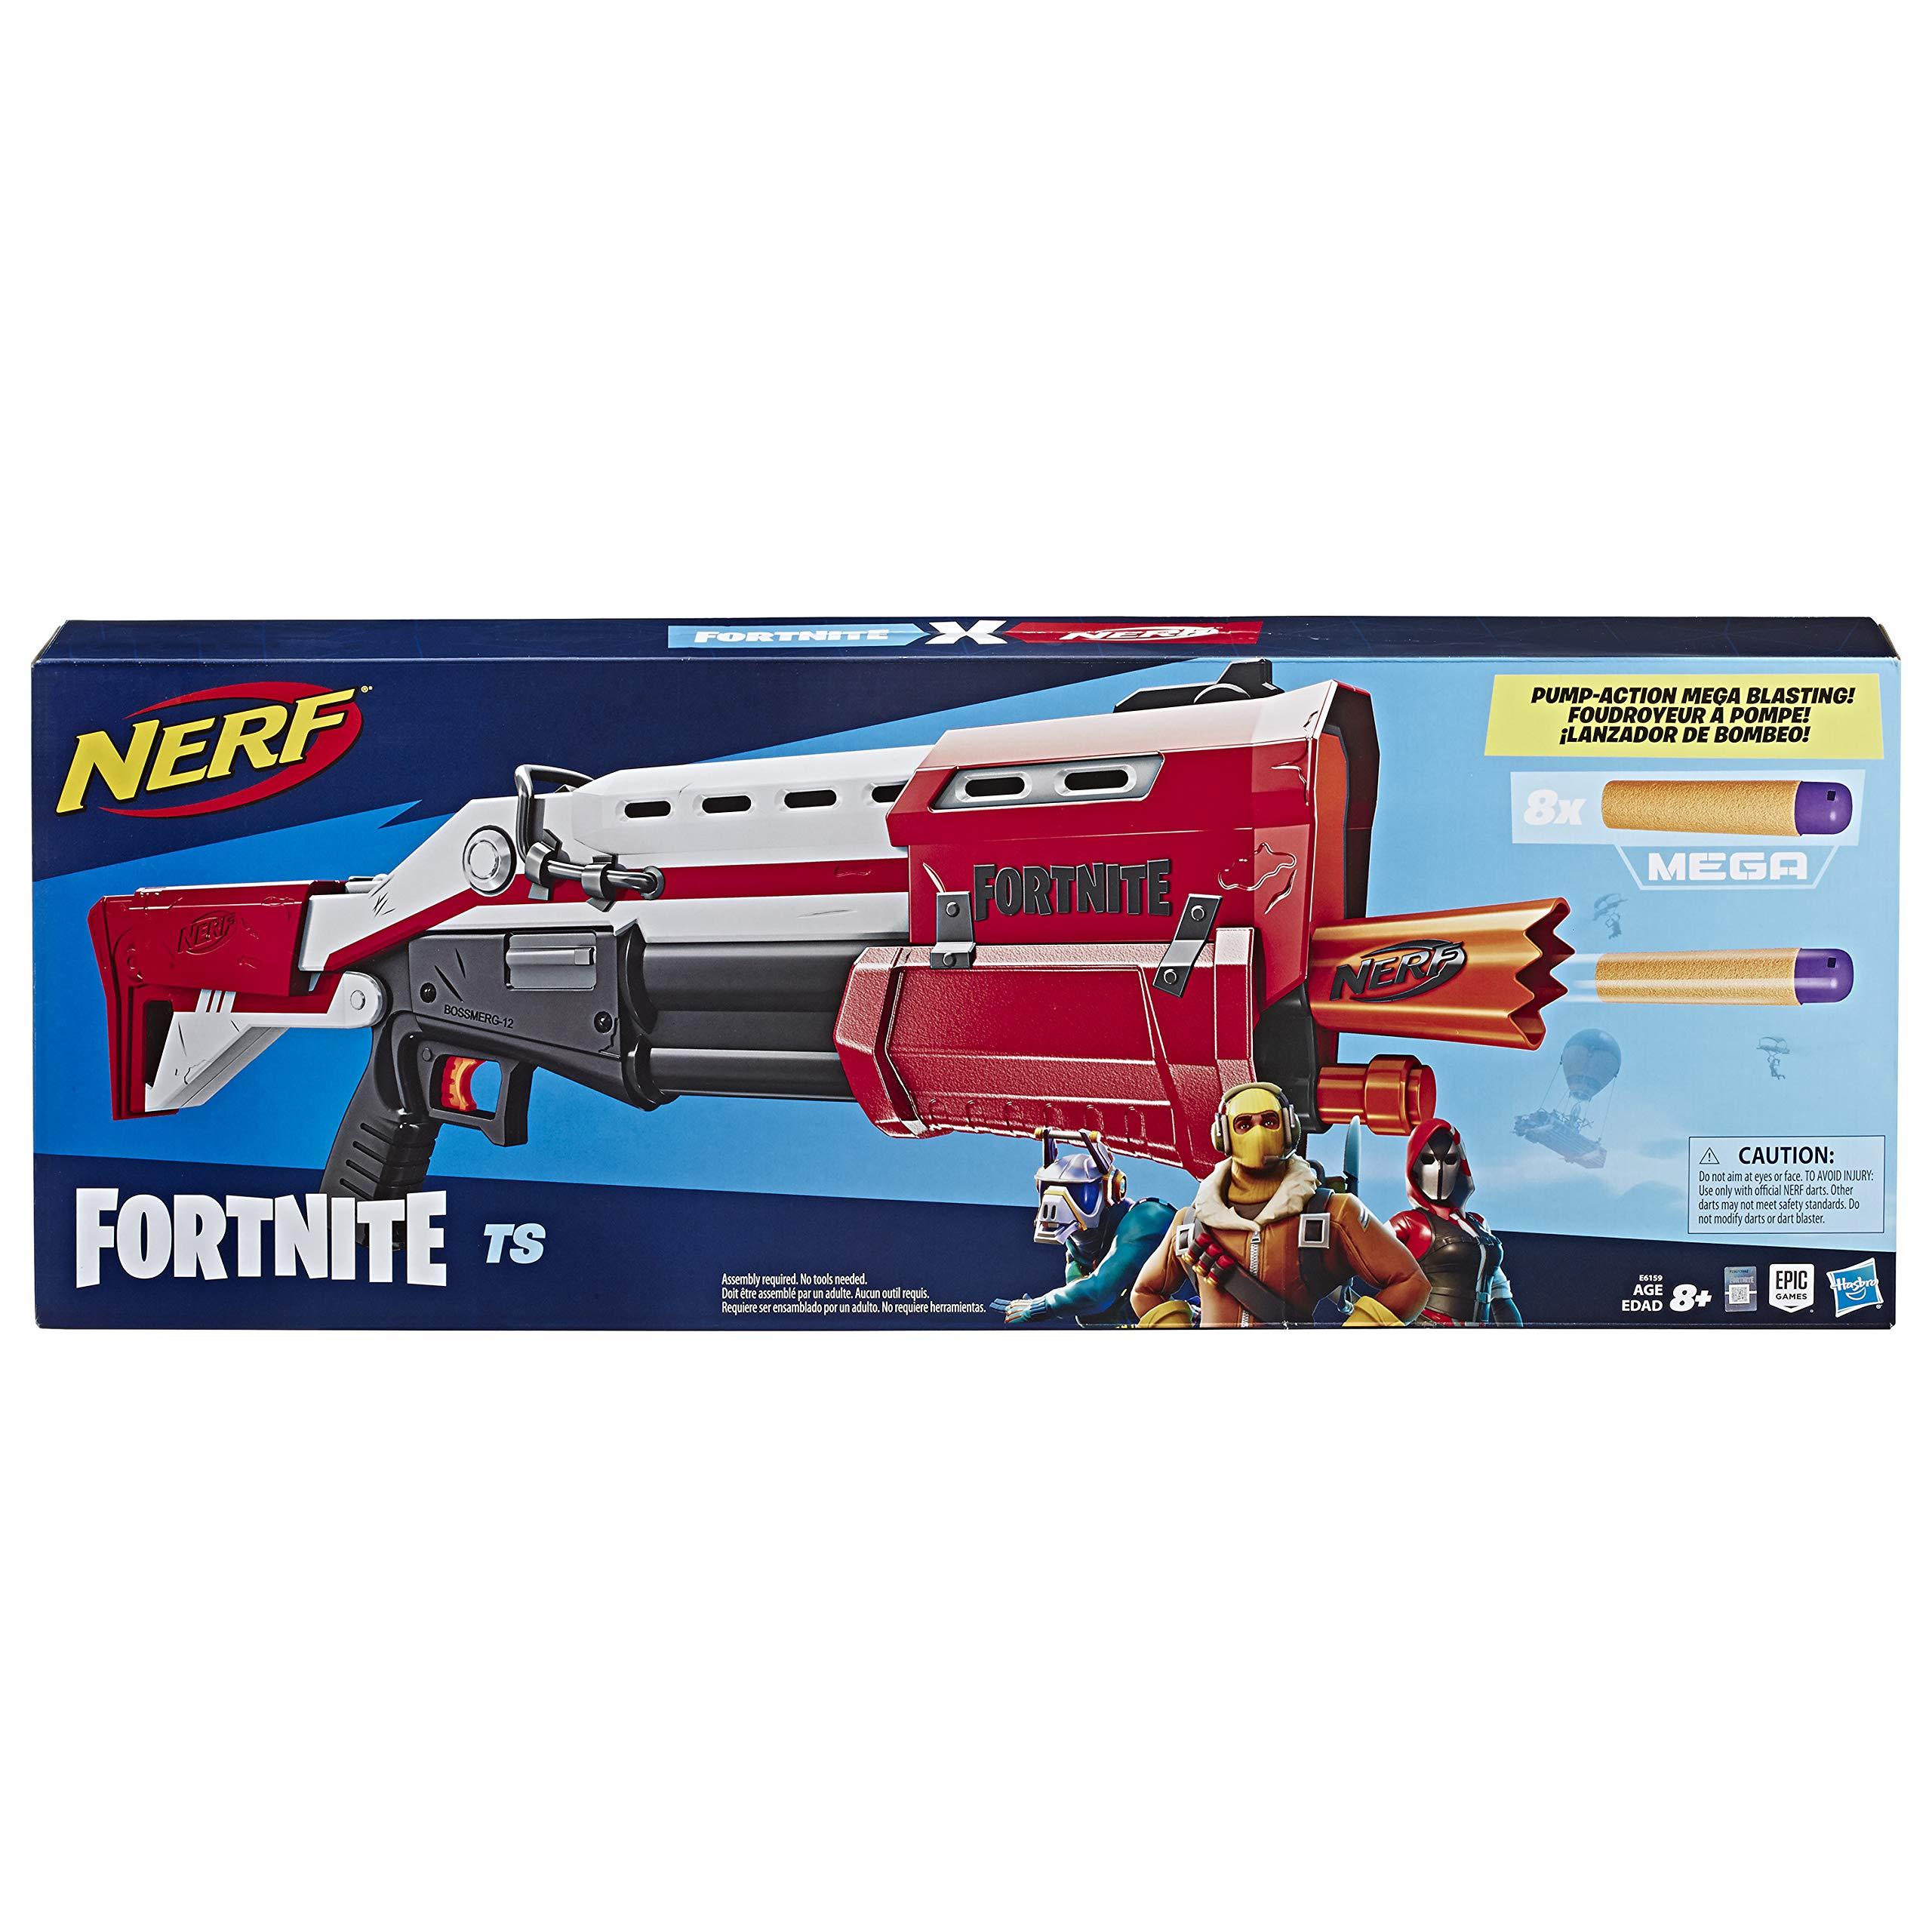 Nerf Fortnite TS-1 Blaster by NERF (Image #2)